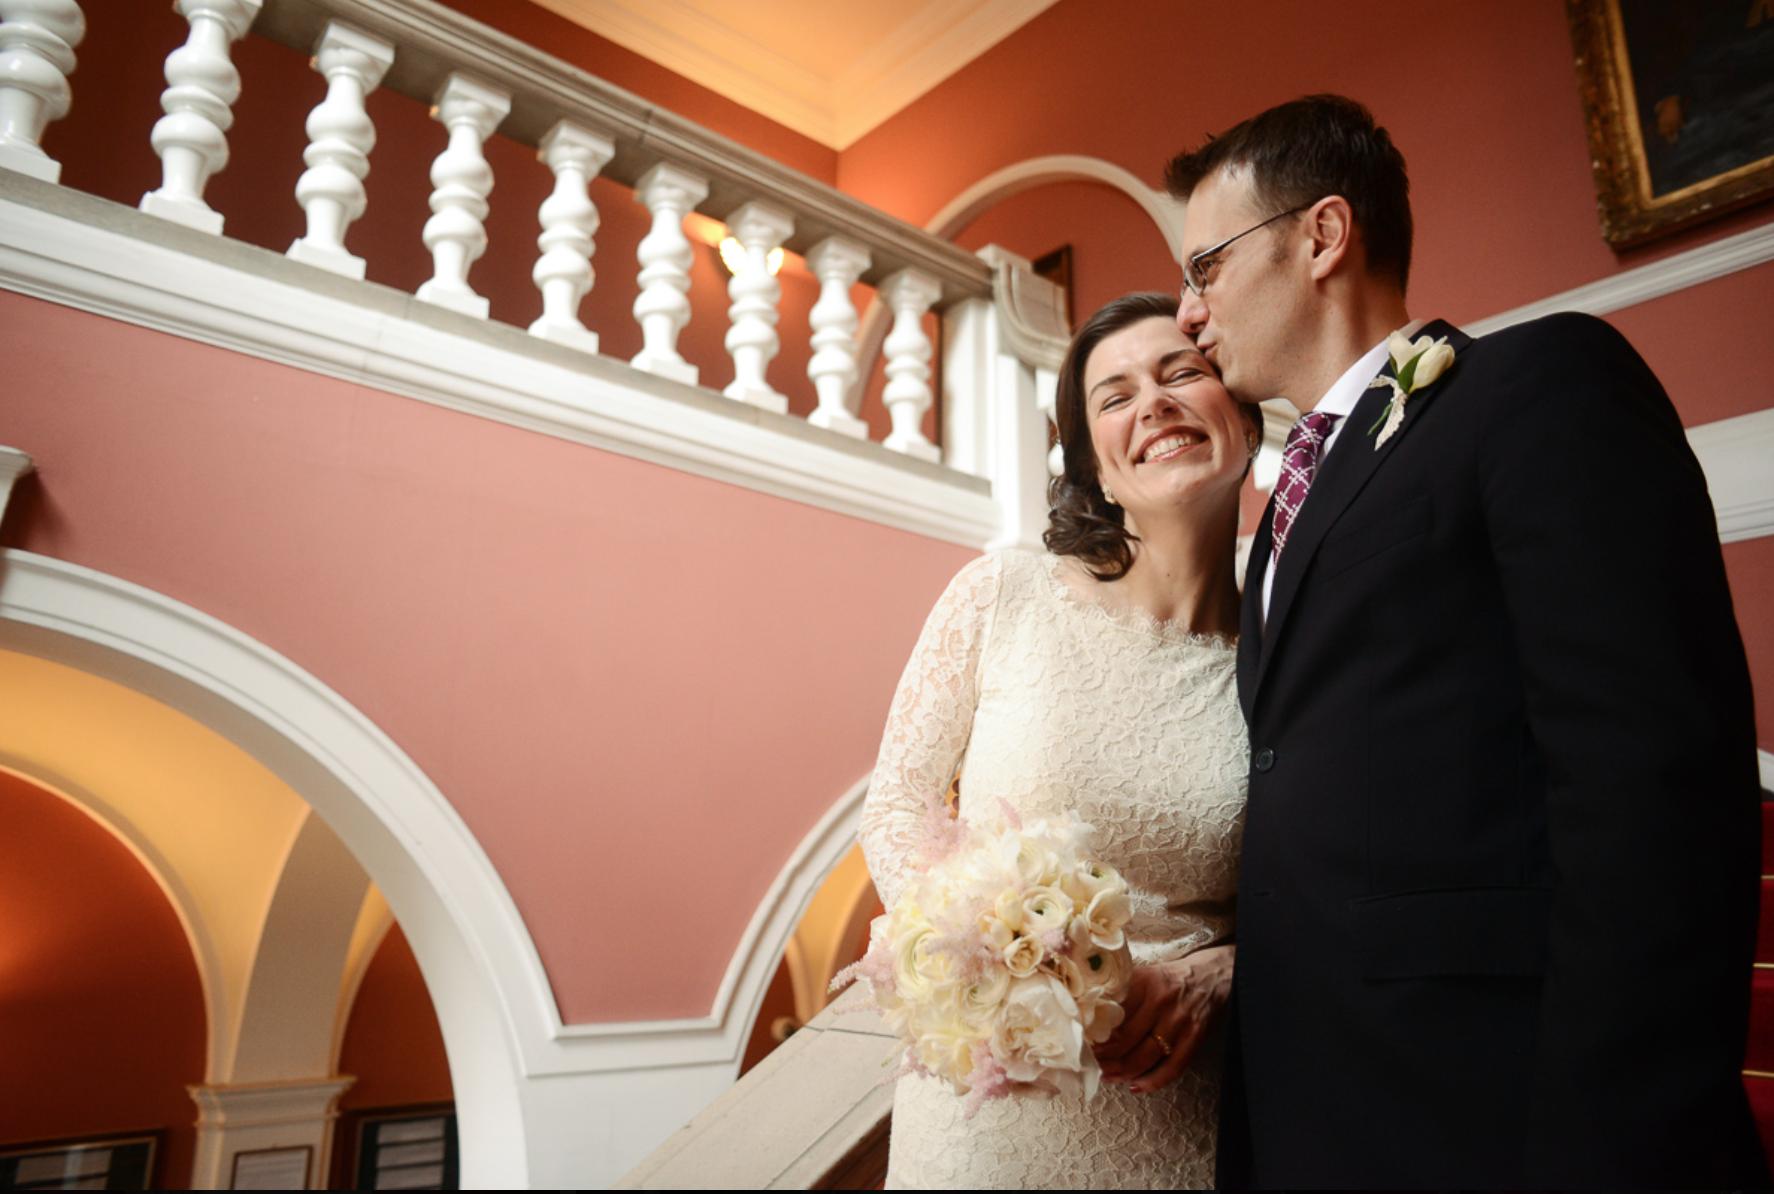 Kensington and Chelsea Register Office Weddings